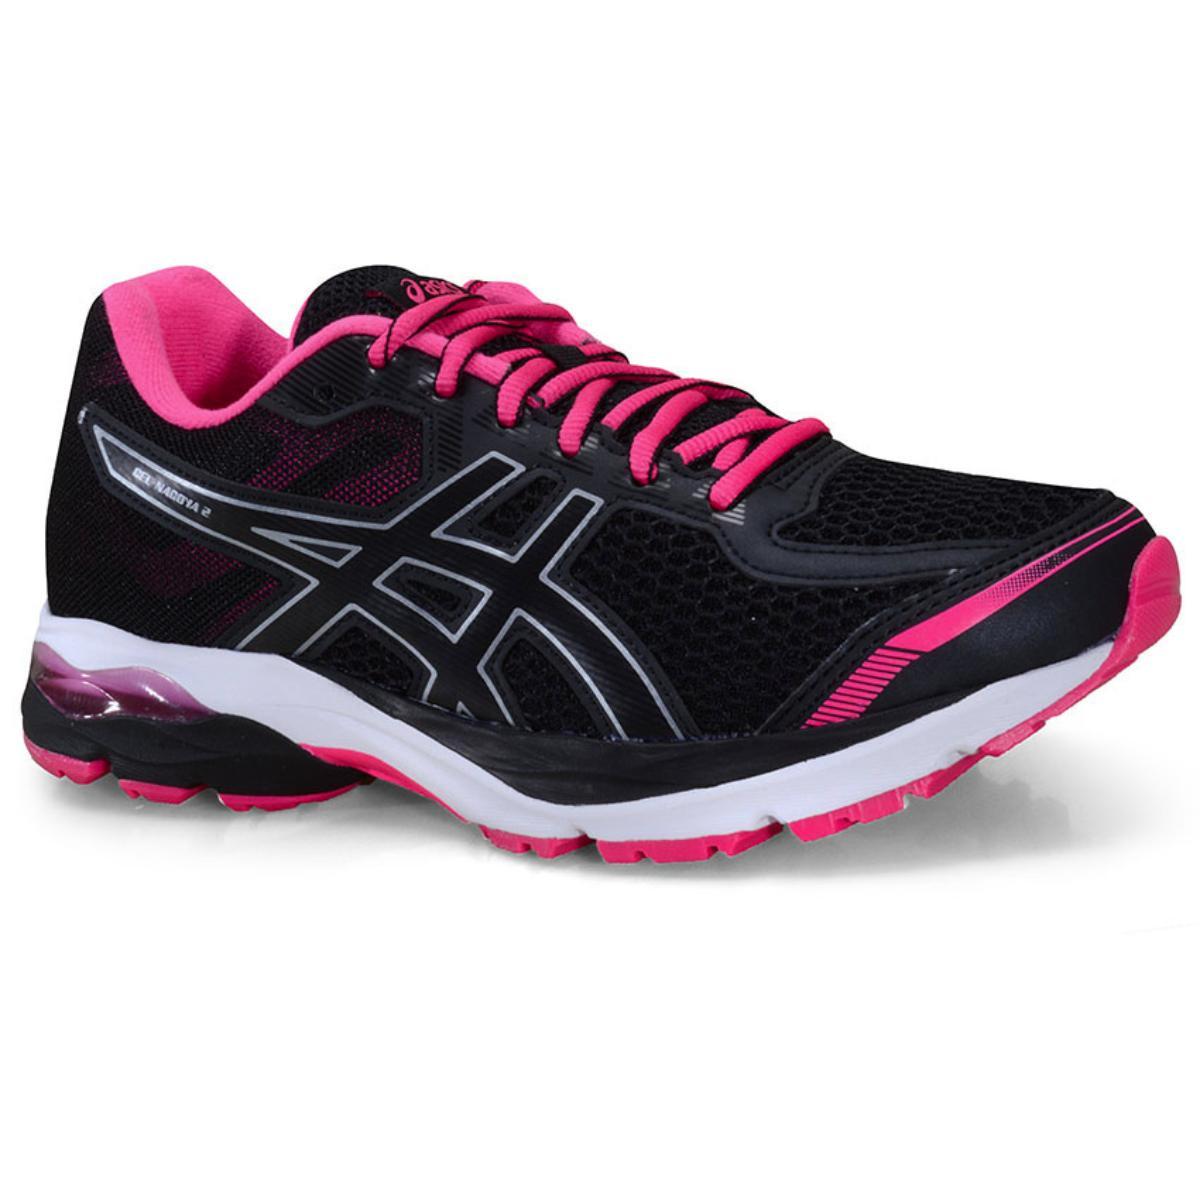 Tênis Feminino Asics 1012a777.003 Gel Nagoya 2 Preto/pink